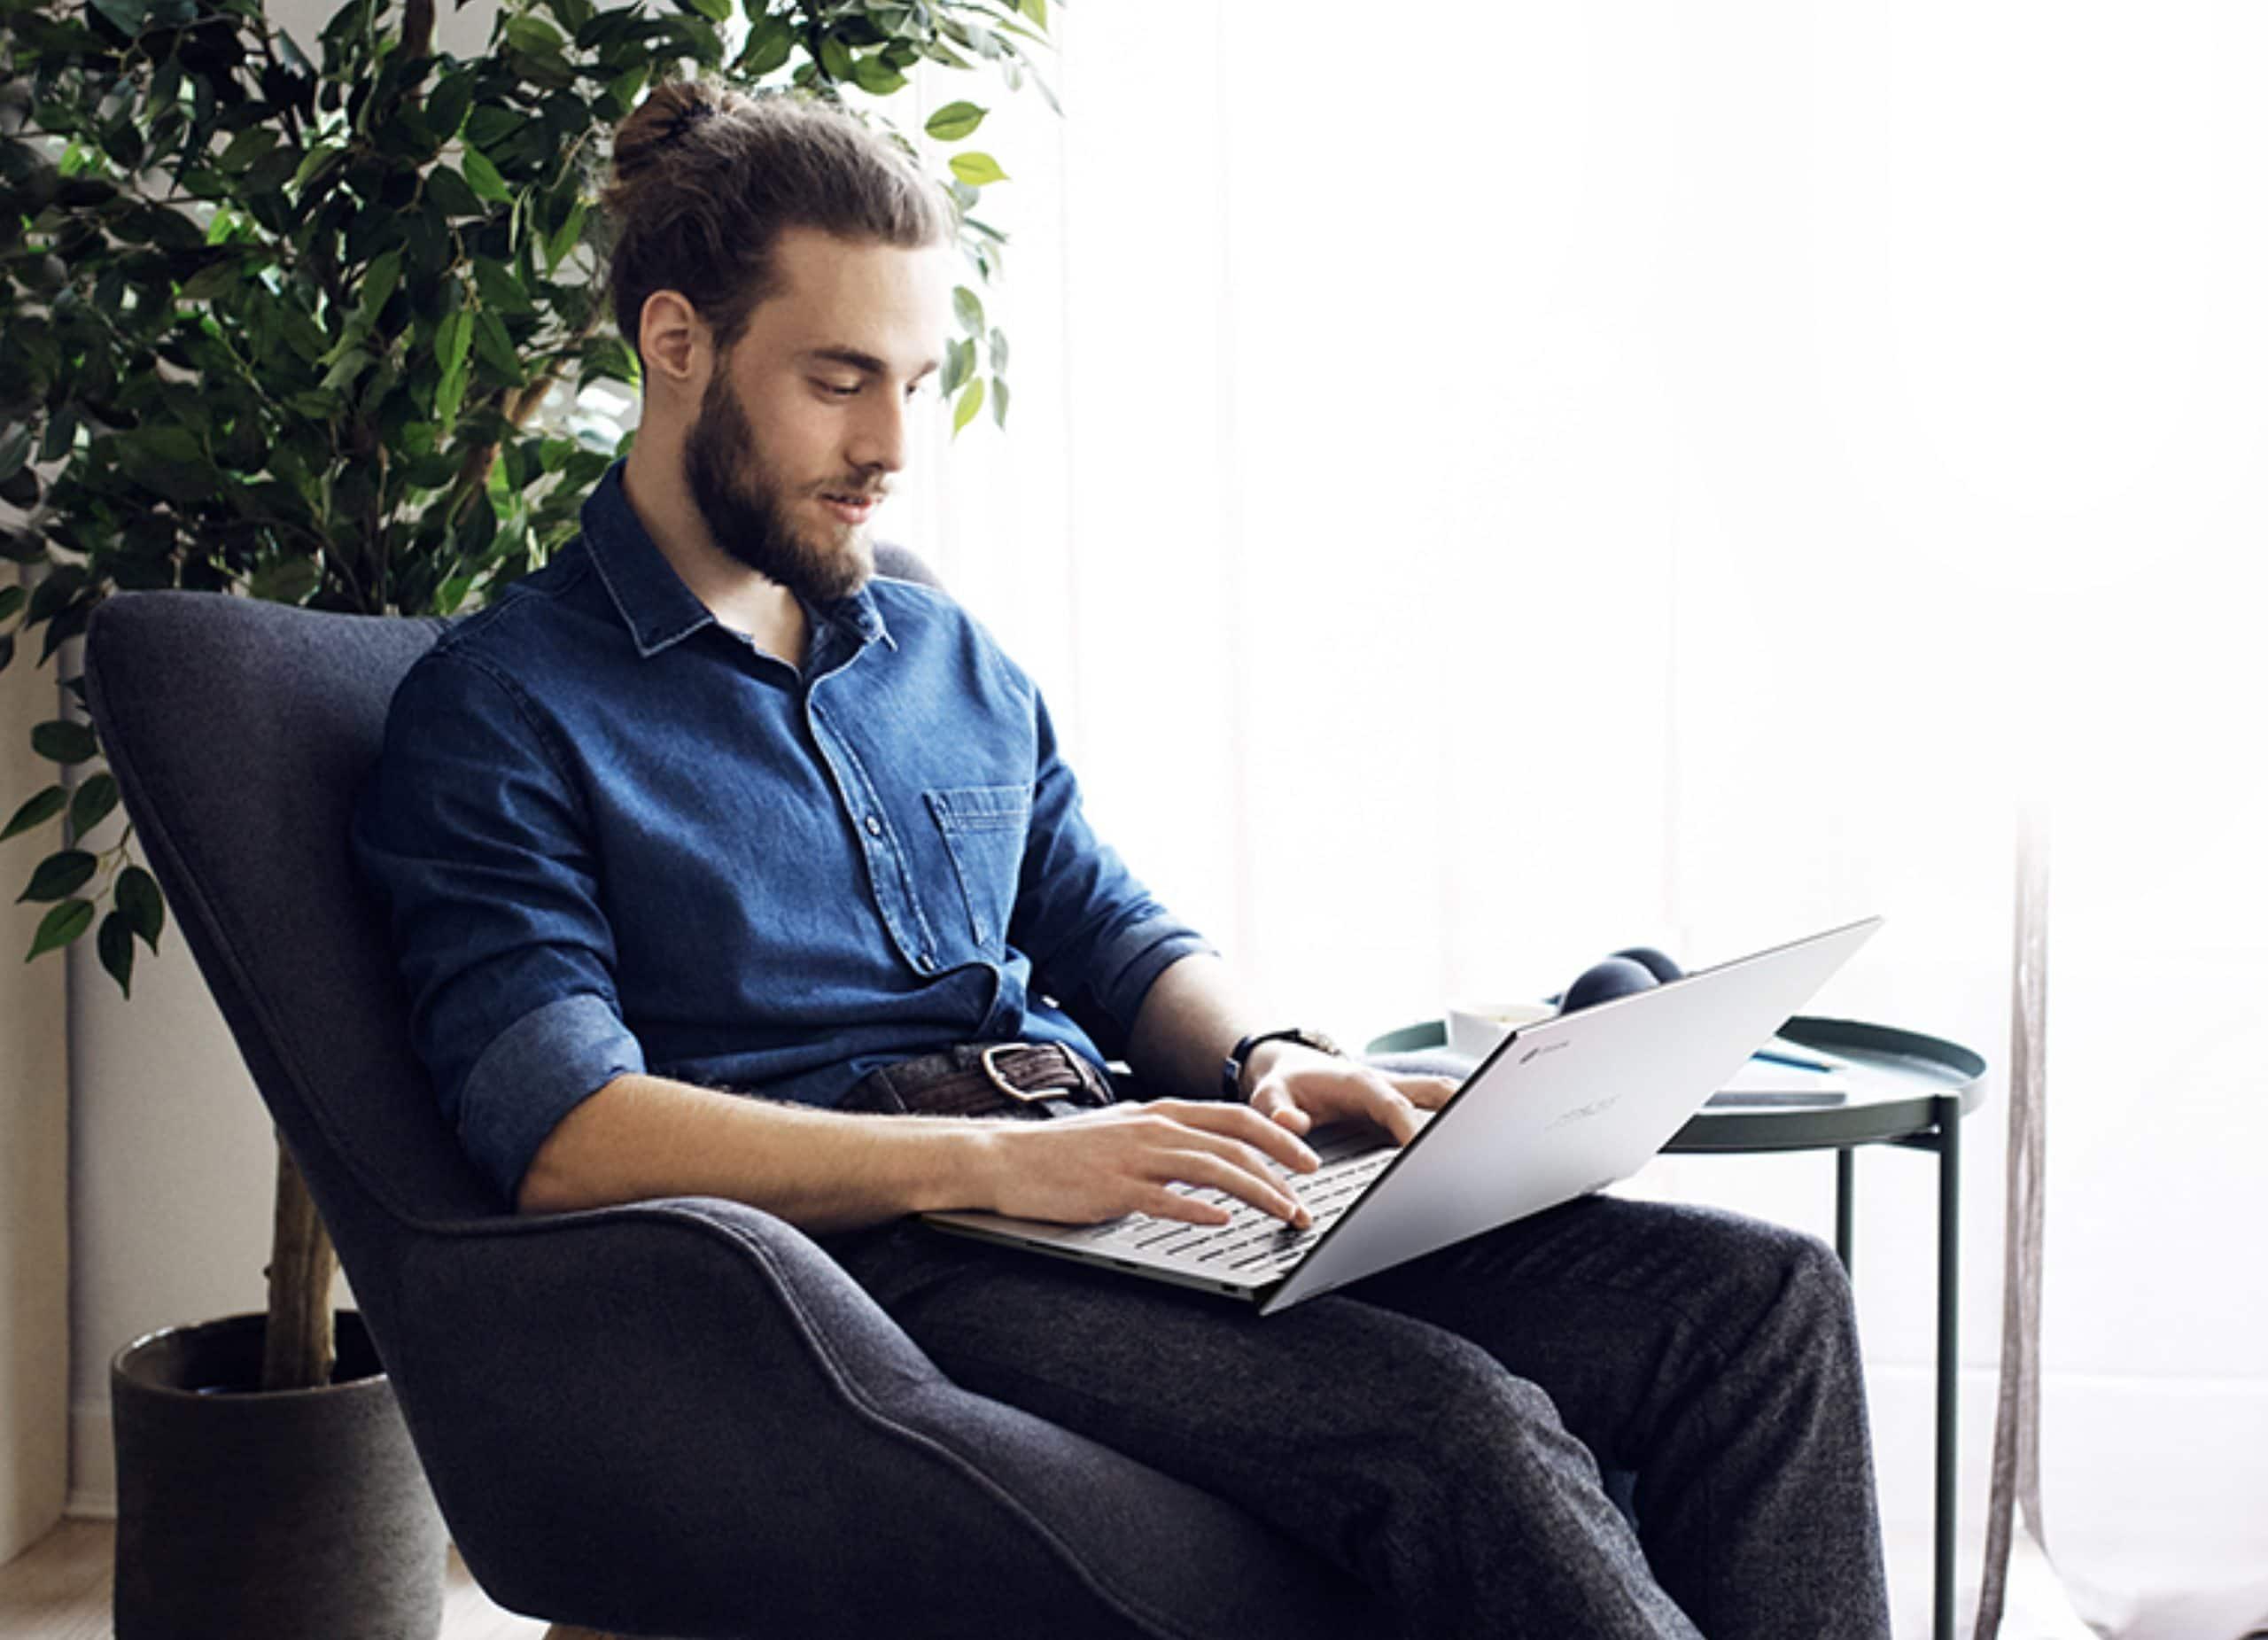 Longest Lasting Laptops In 2021